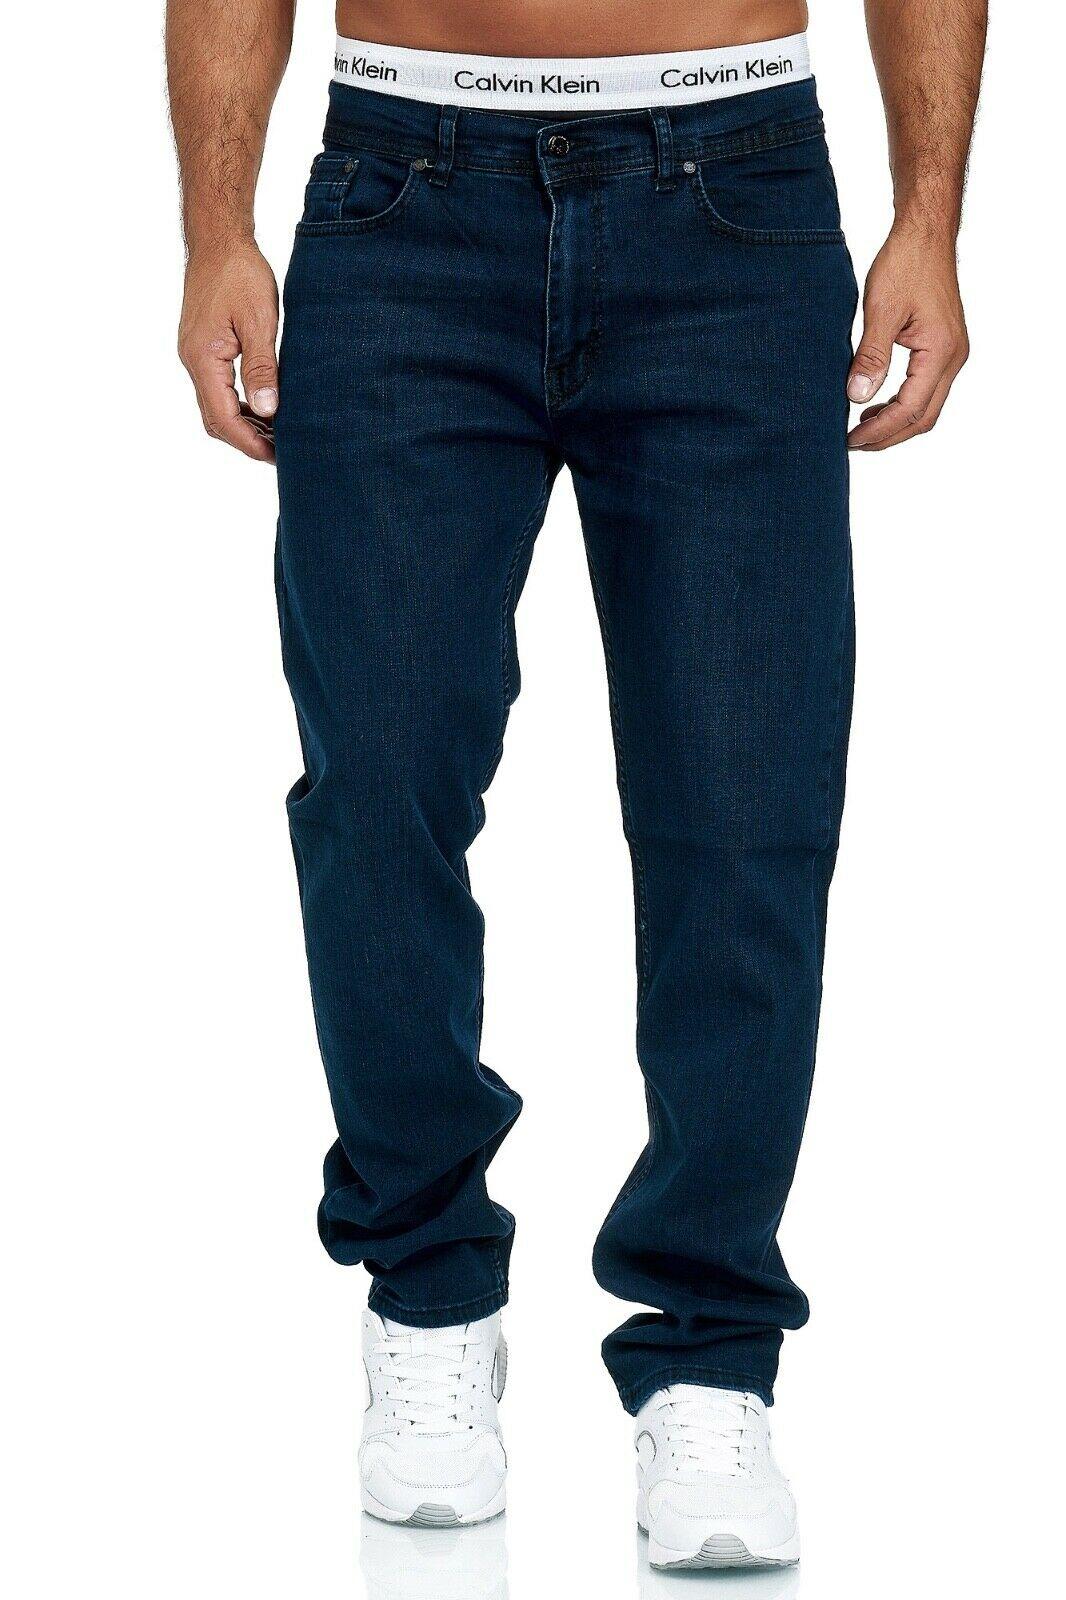 Herren-Jeans-Hose-Denim-KC-Black-Washed-Straight-Cut-Regular-Dicke-Naht-naehte Indexbild 41